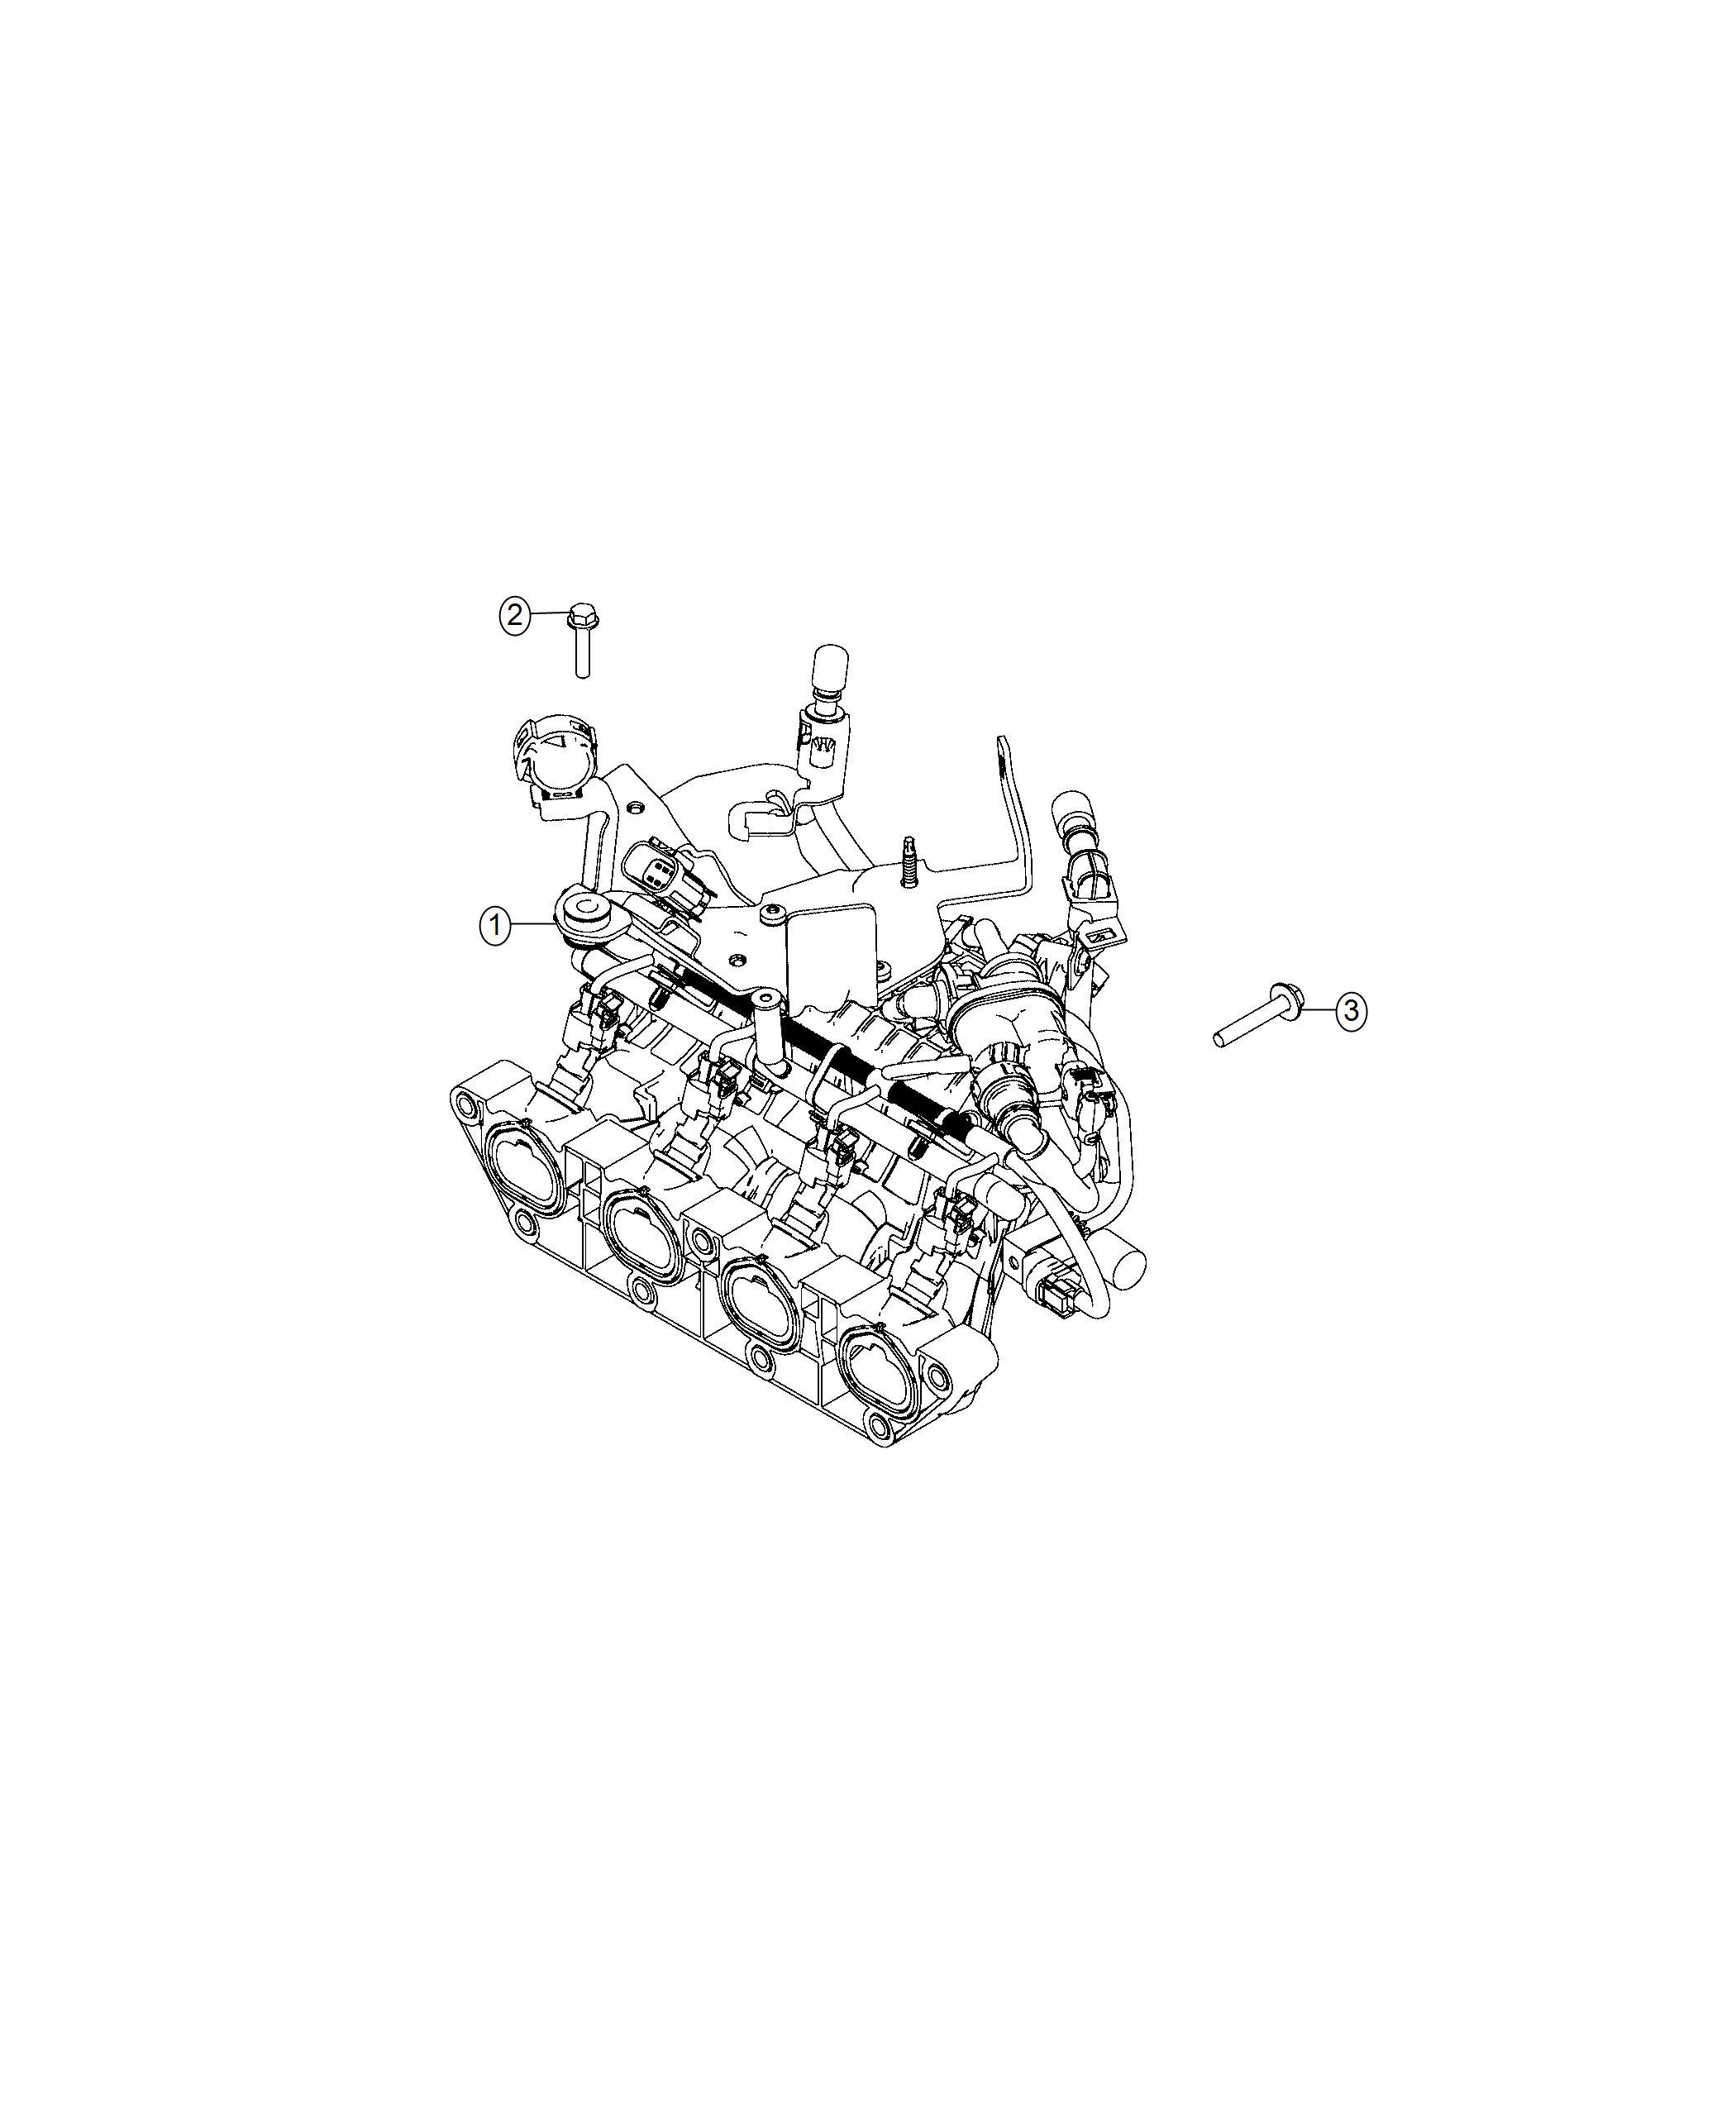 Fiat 124 Spider Manifold Engine Intake Intake